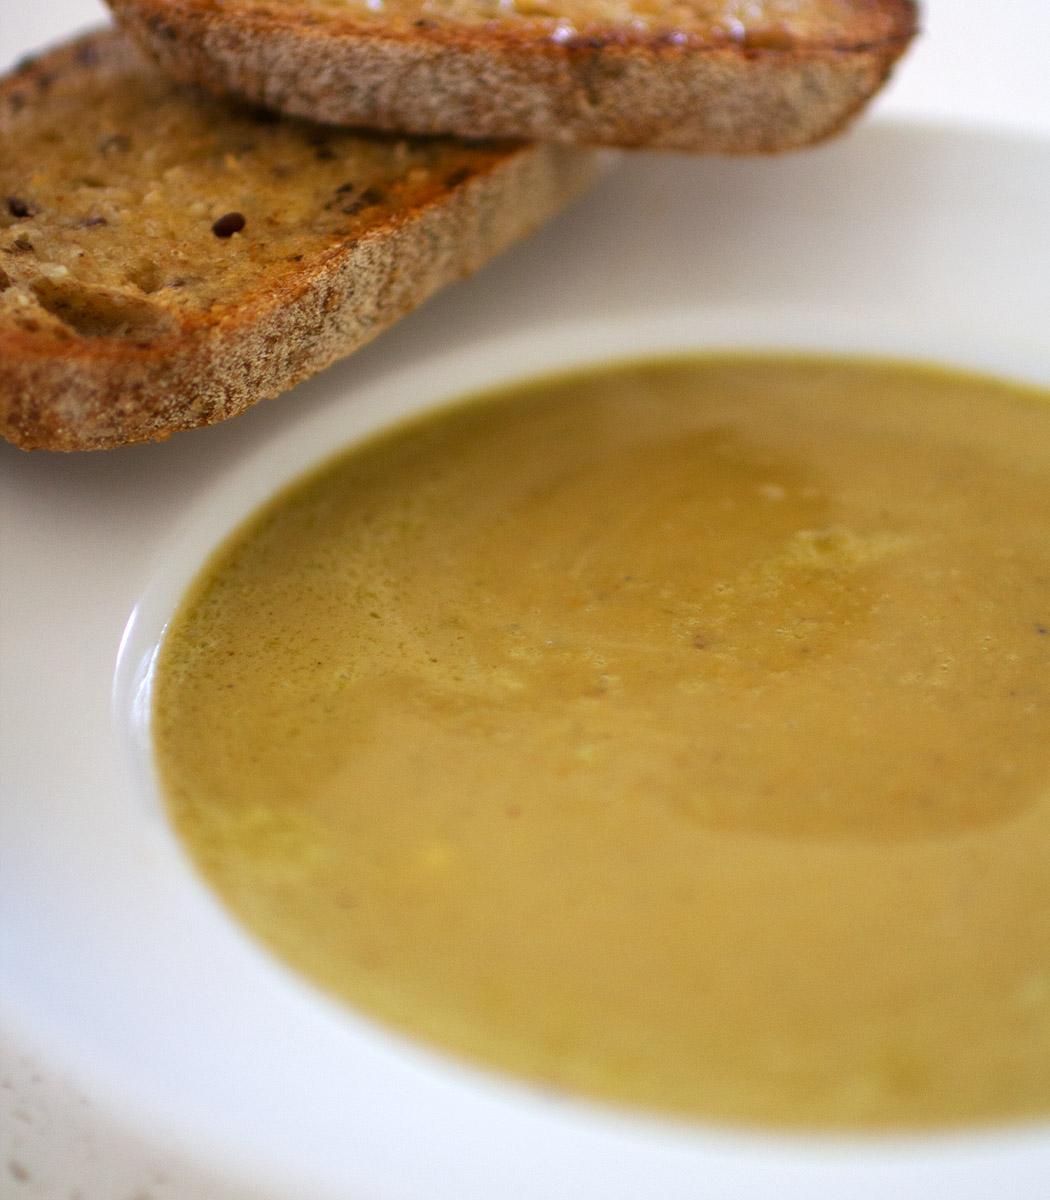 Dorset Blue Vinny Chestnut & Squash Soup